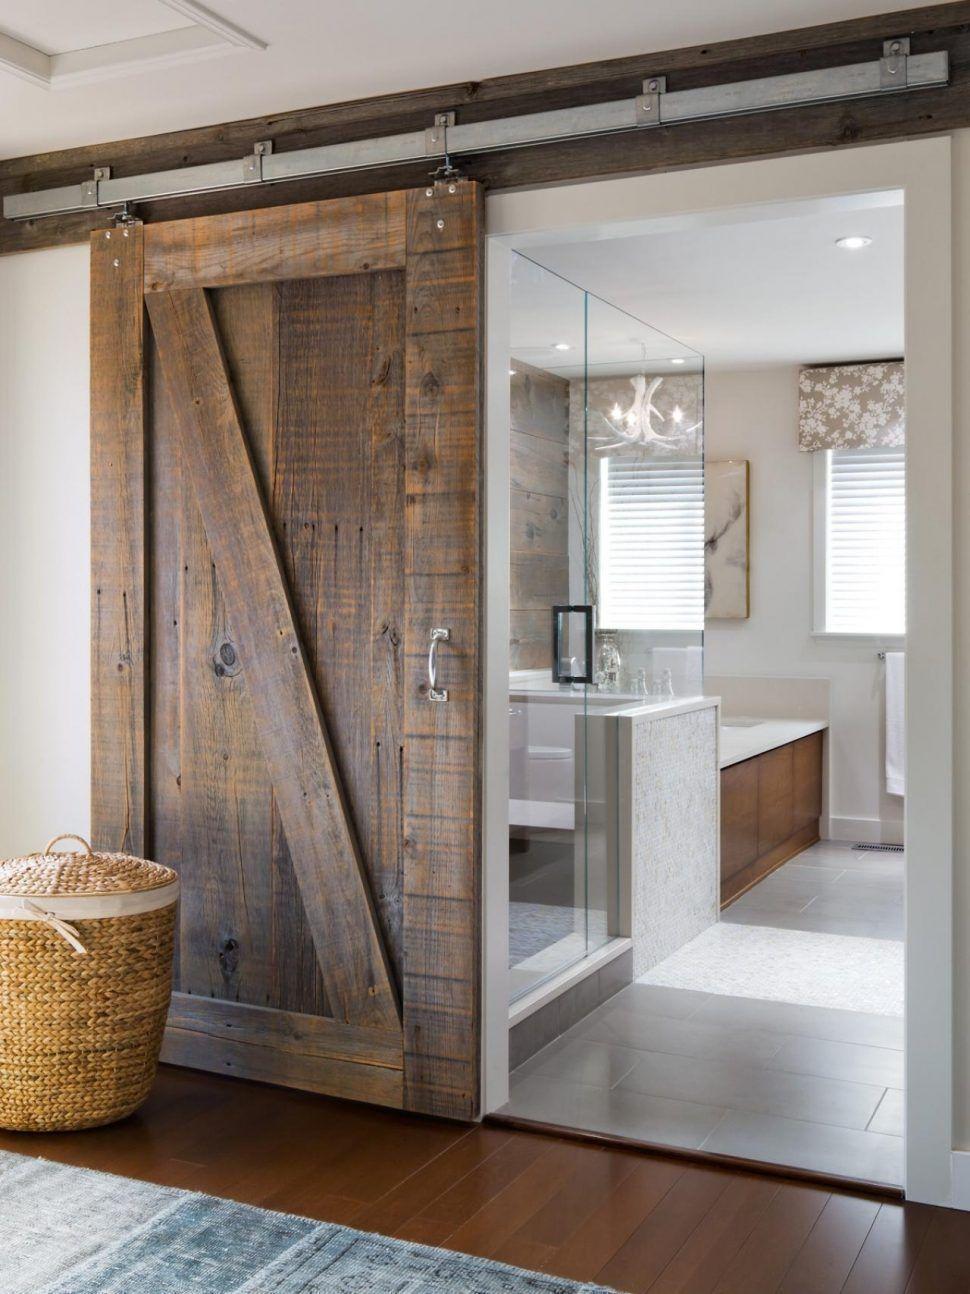 Bathrooms design elegant how to make interior sliding barn - How to make an interior sliding barn door ...